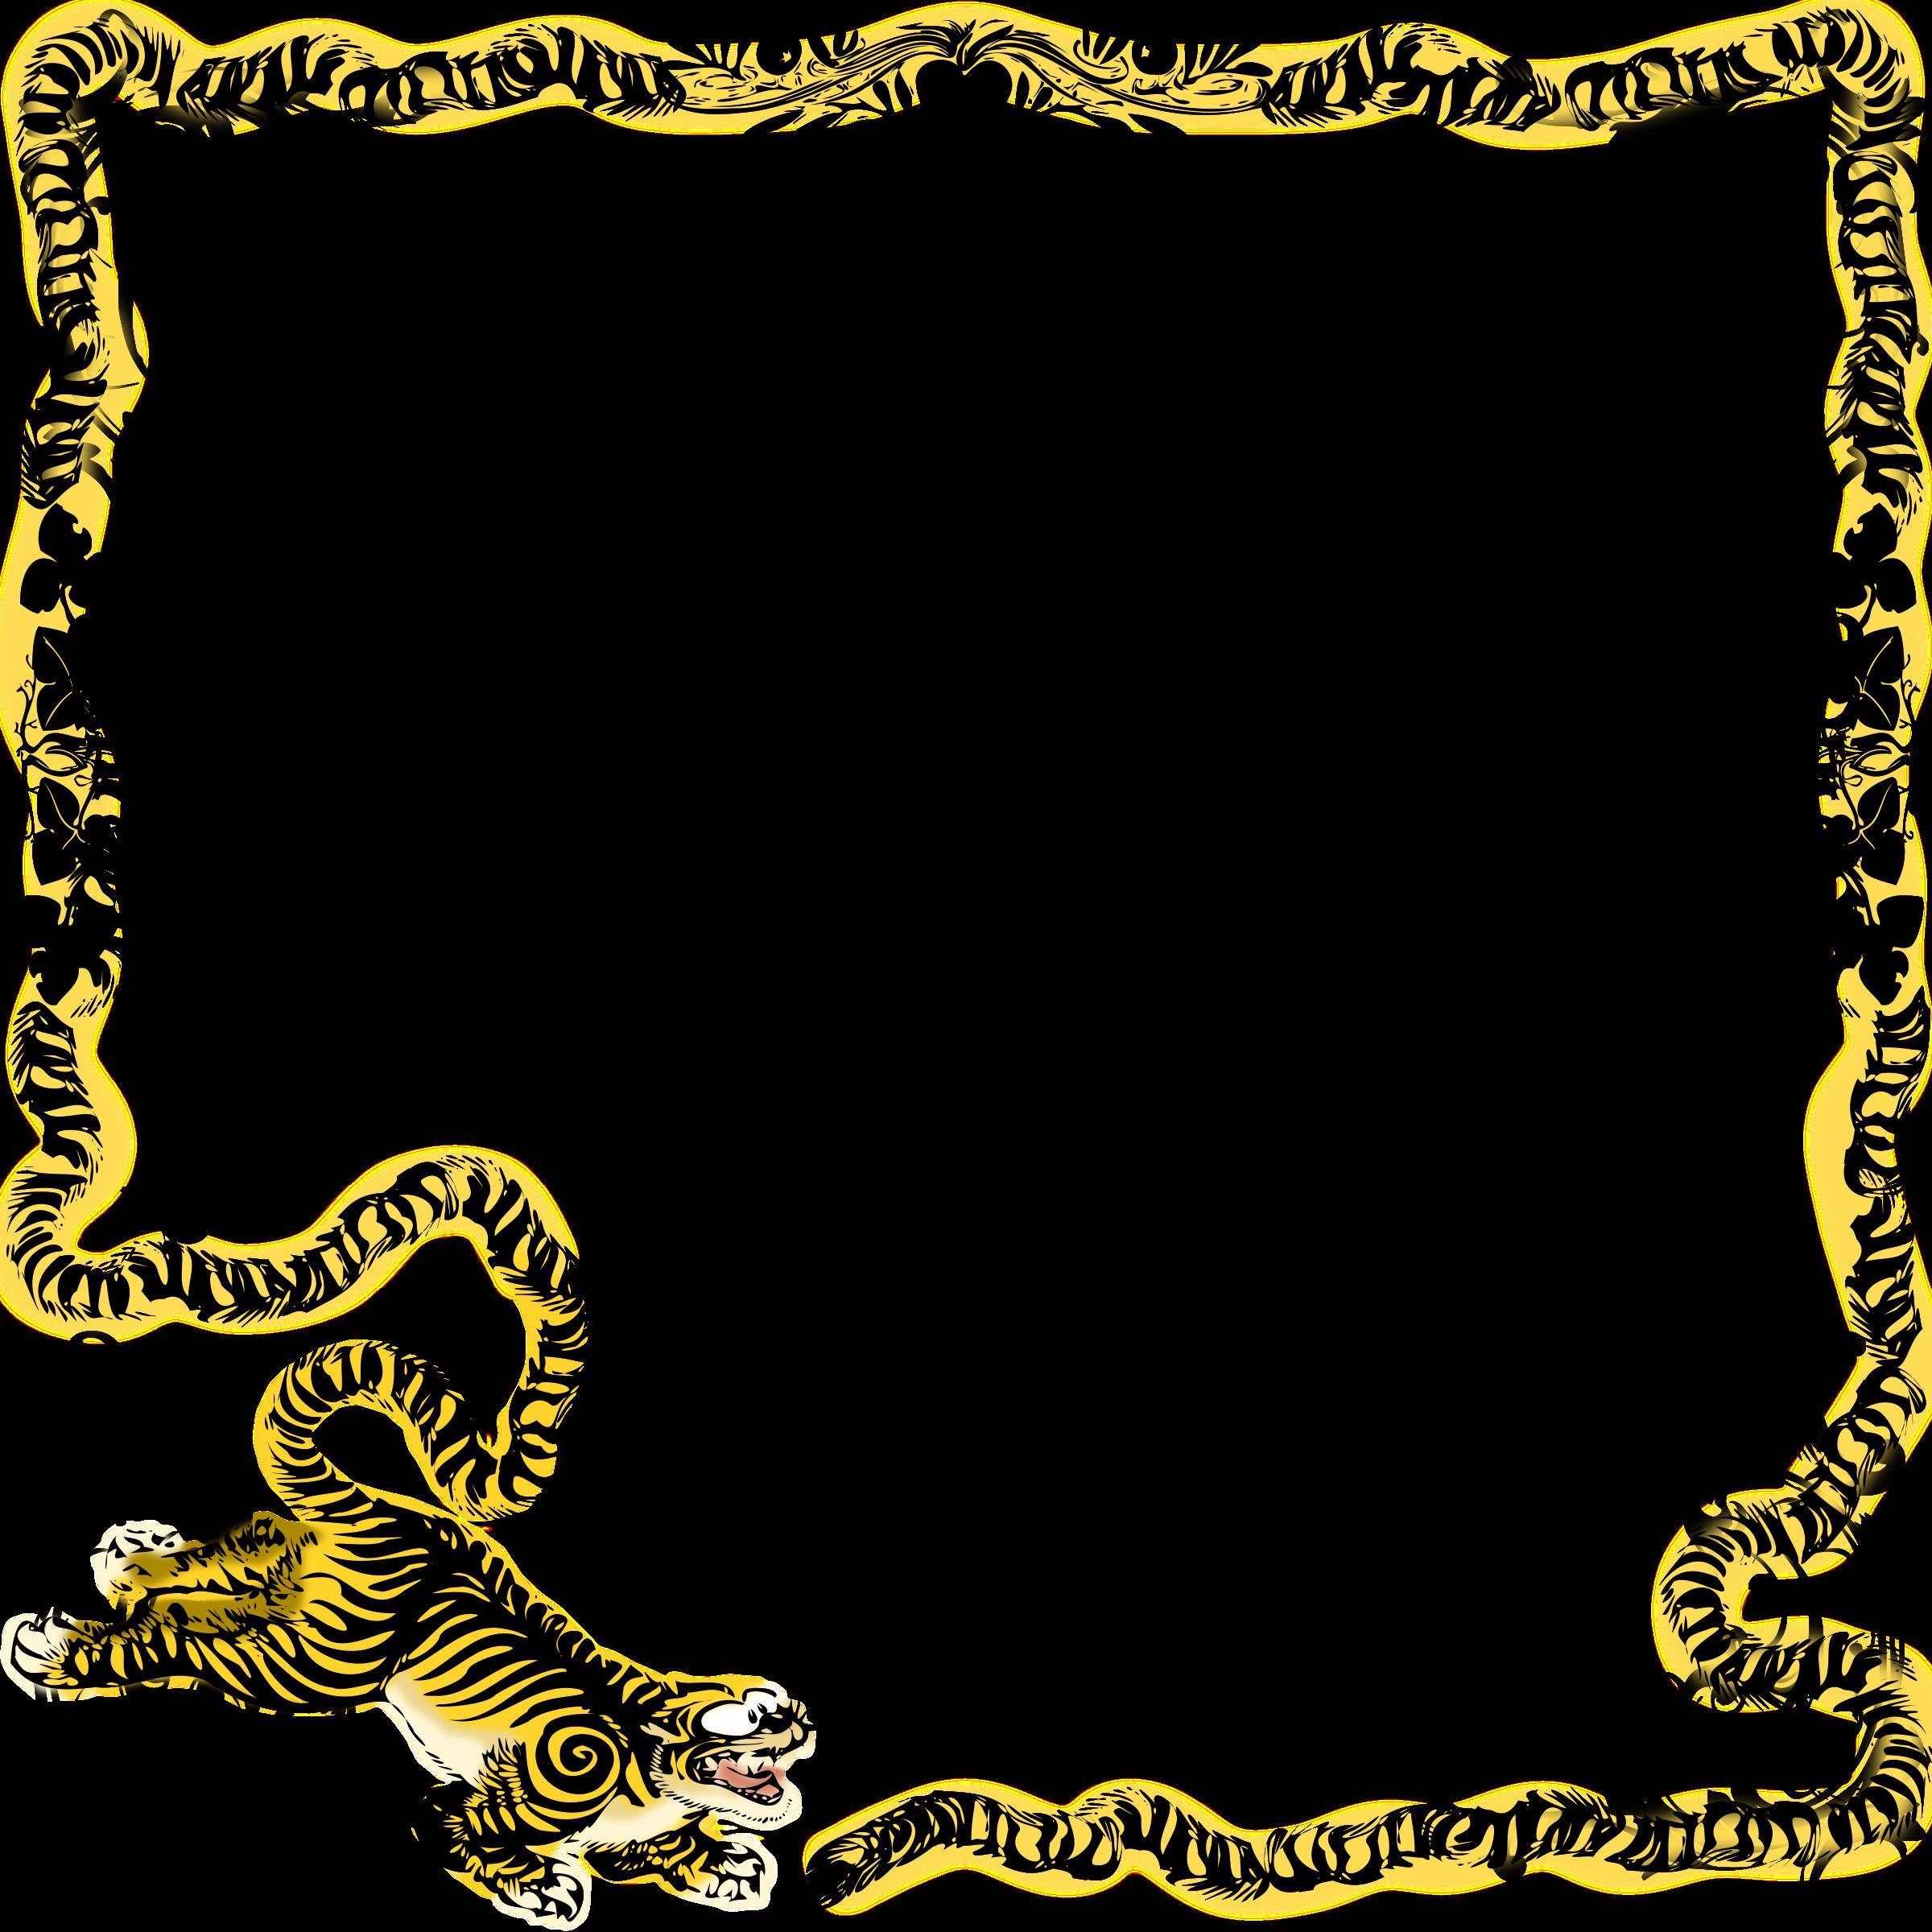 Frames clipart animal. Tiger frame mono big